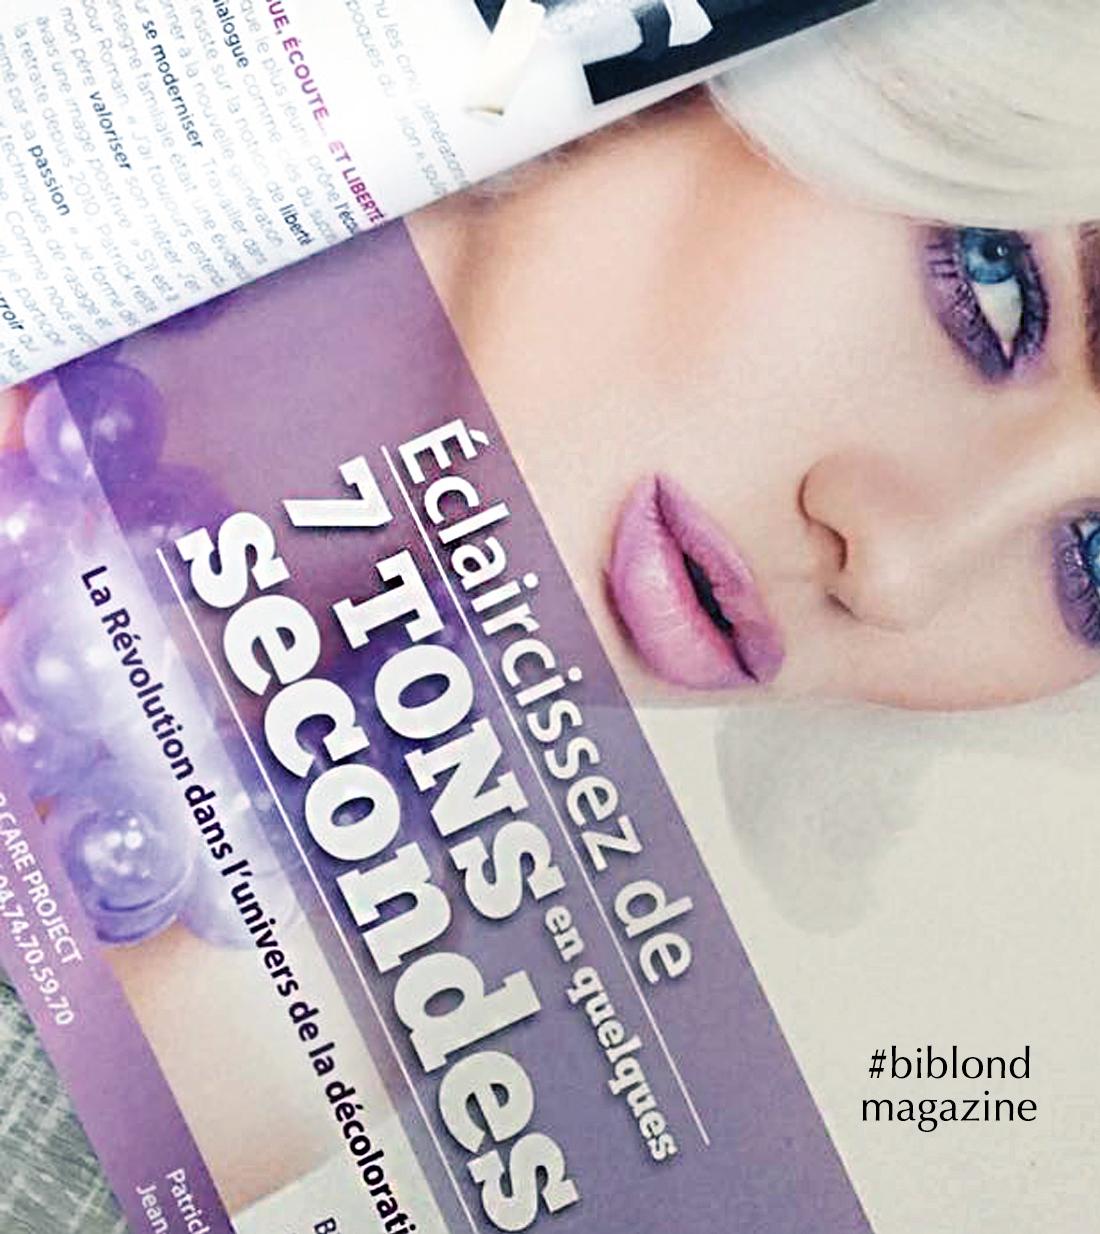 hcp affiche biblond magazine quadricolore